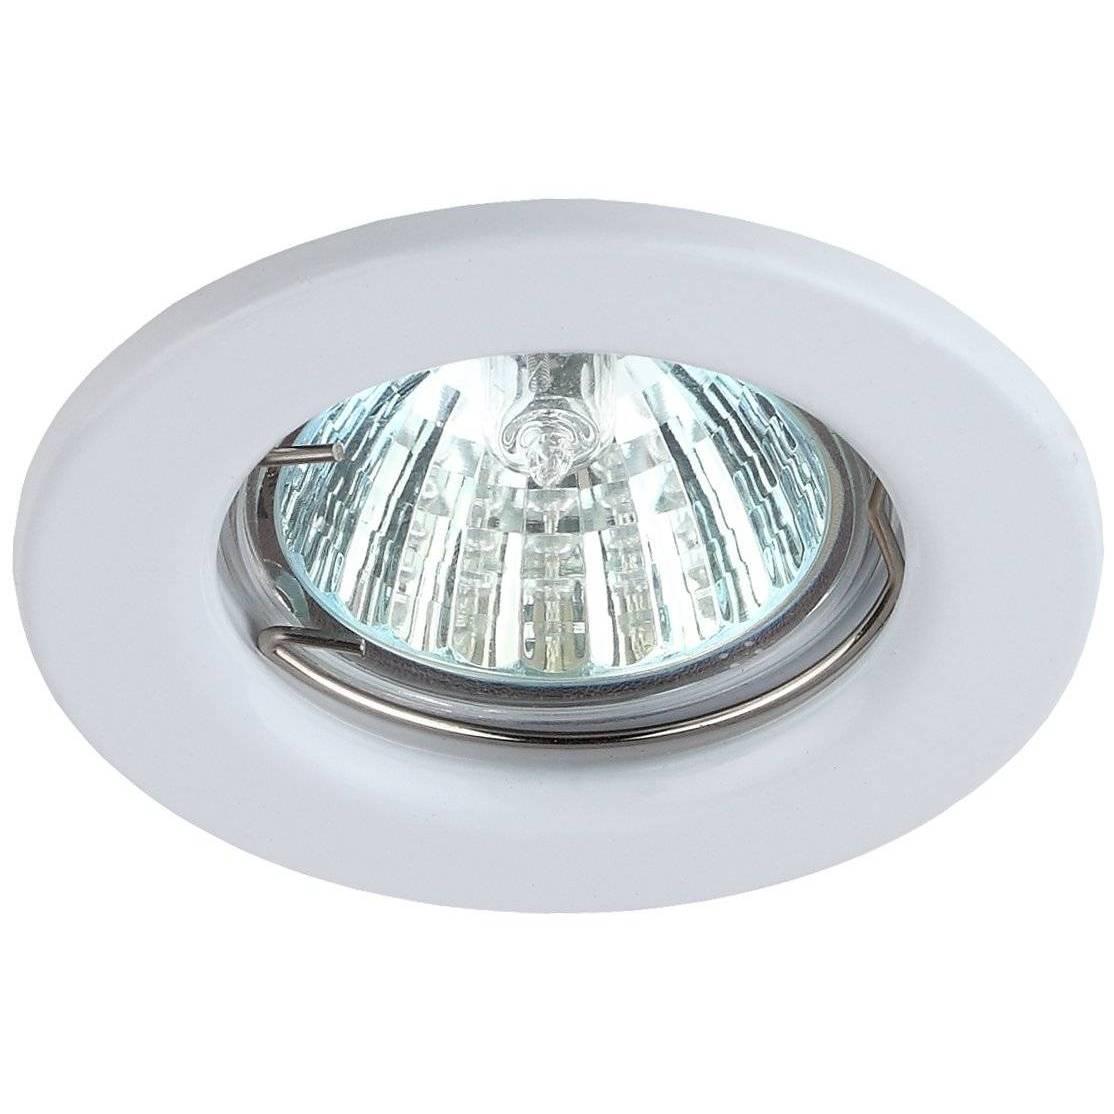 ST1 WH Lamp Era Stamped MR16, 12 V, 50W White (1/100) 5055398625460